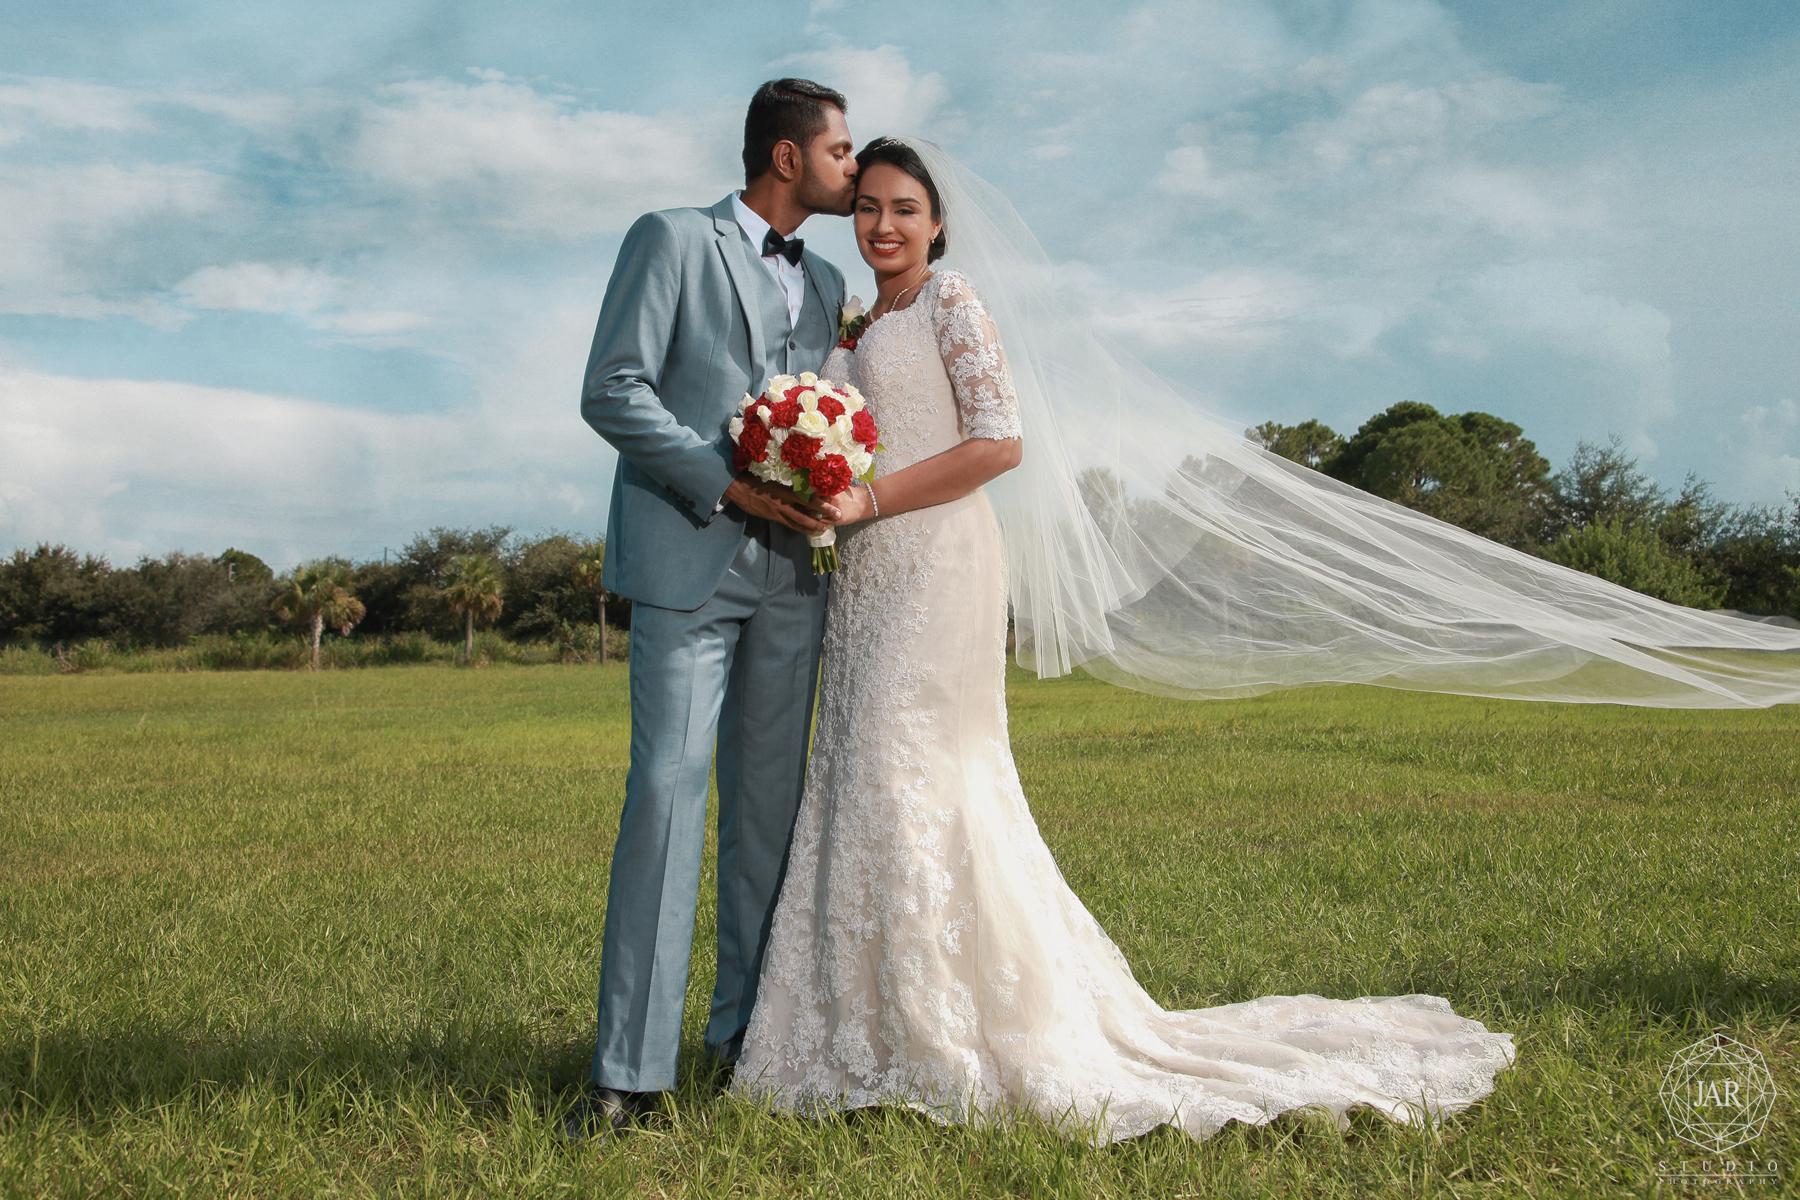 26-romantic-wedding-portrait-jarstudio-fine-art-photography.jpg